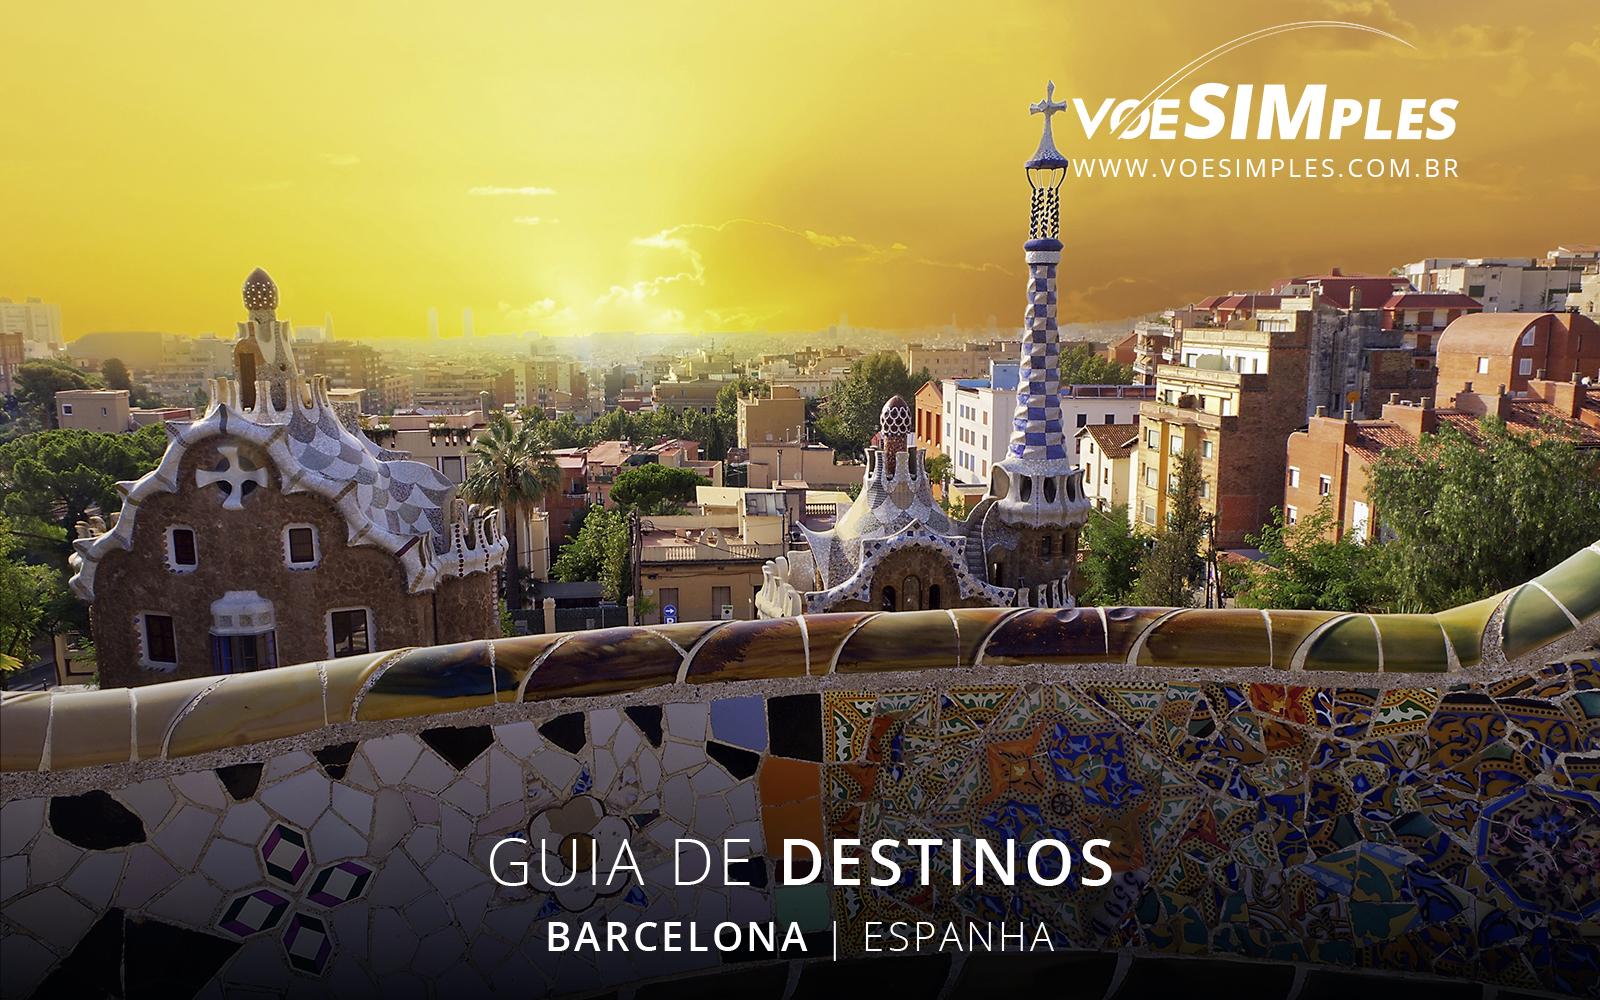 fotos-guia-destinos-voe-simples-barcelona-espanha-guia-viagens-voesimples-barcelona-espanha-pontos-turisticos-barcelona-espanha-fotos-barcelona-01@2x